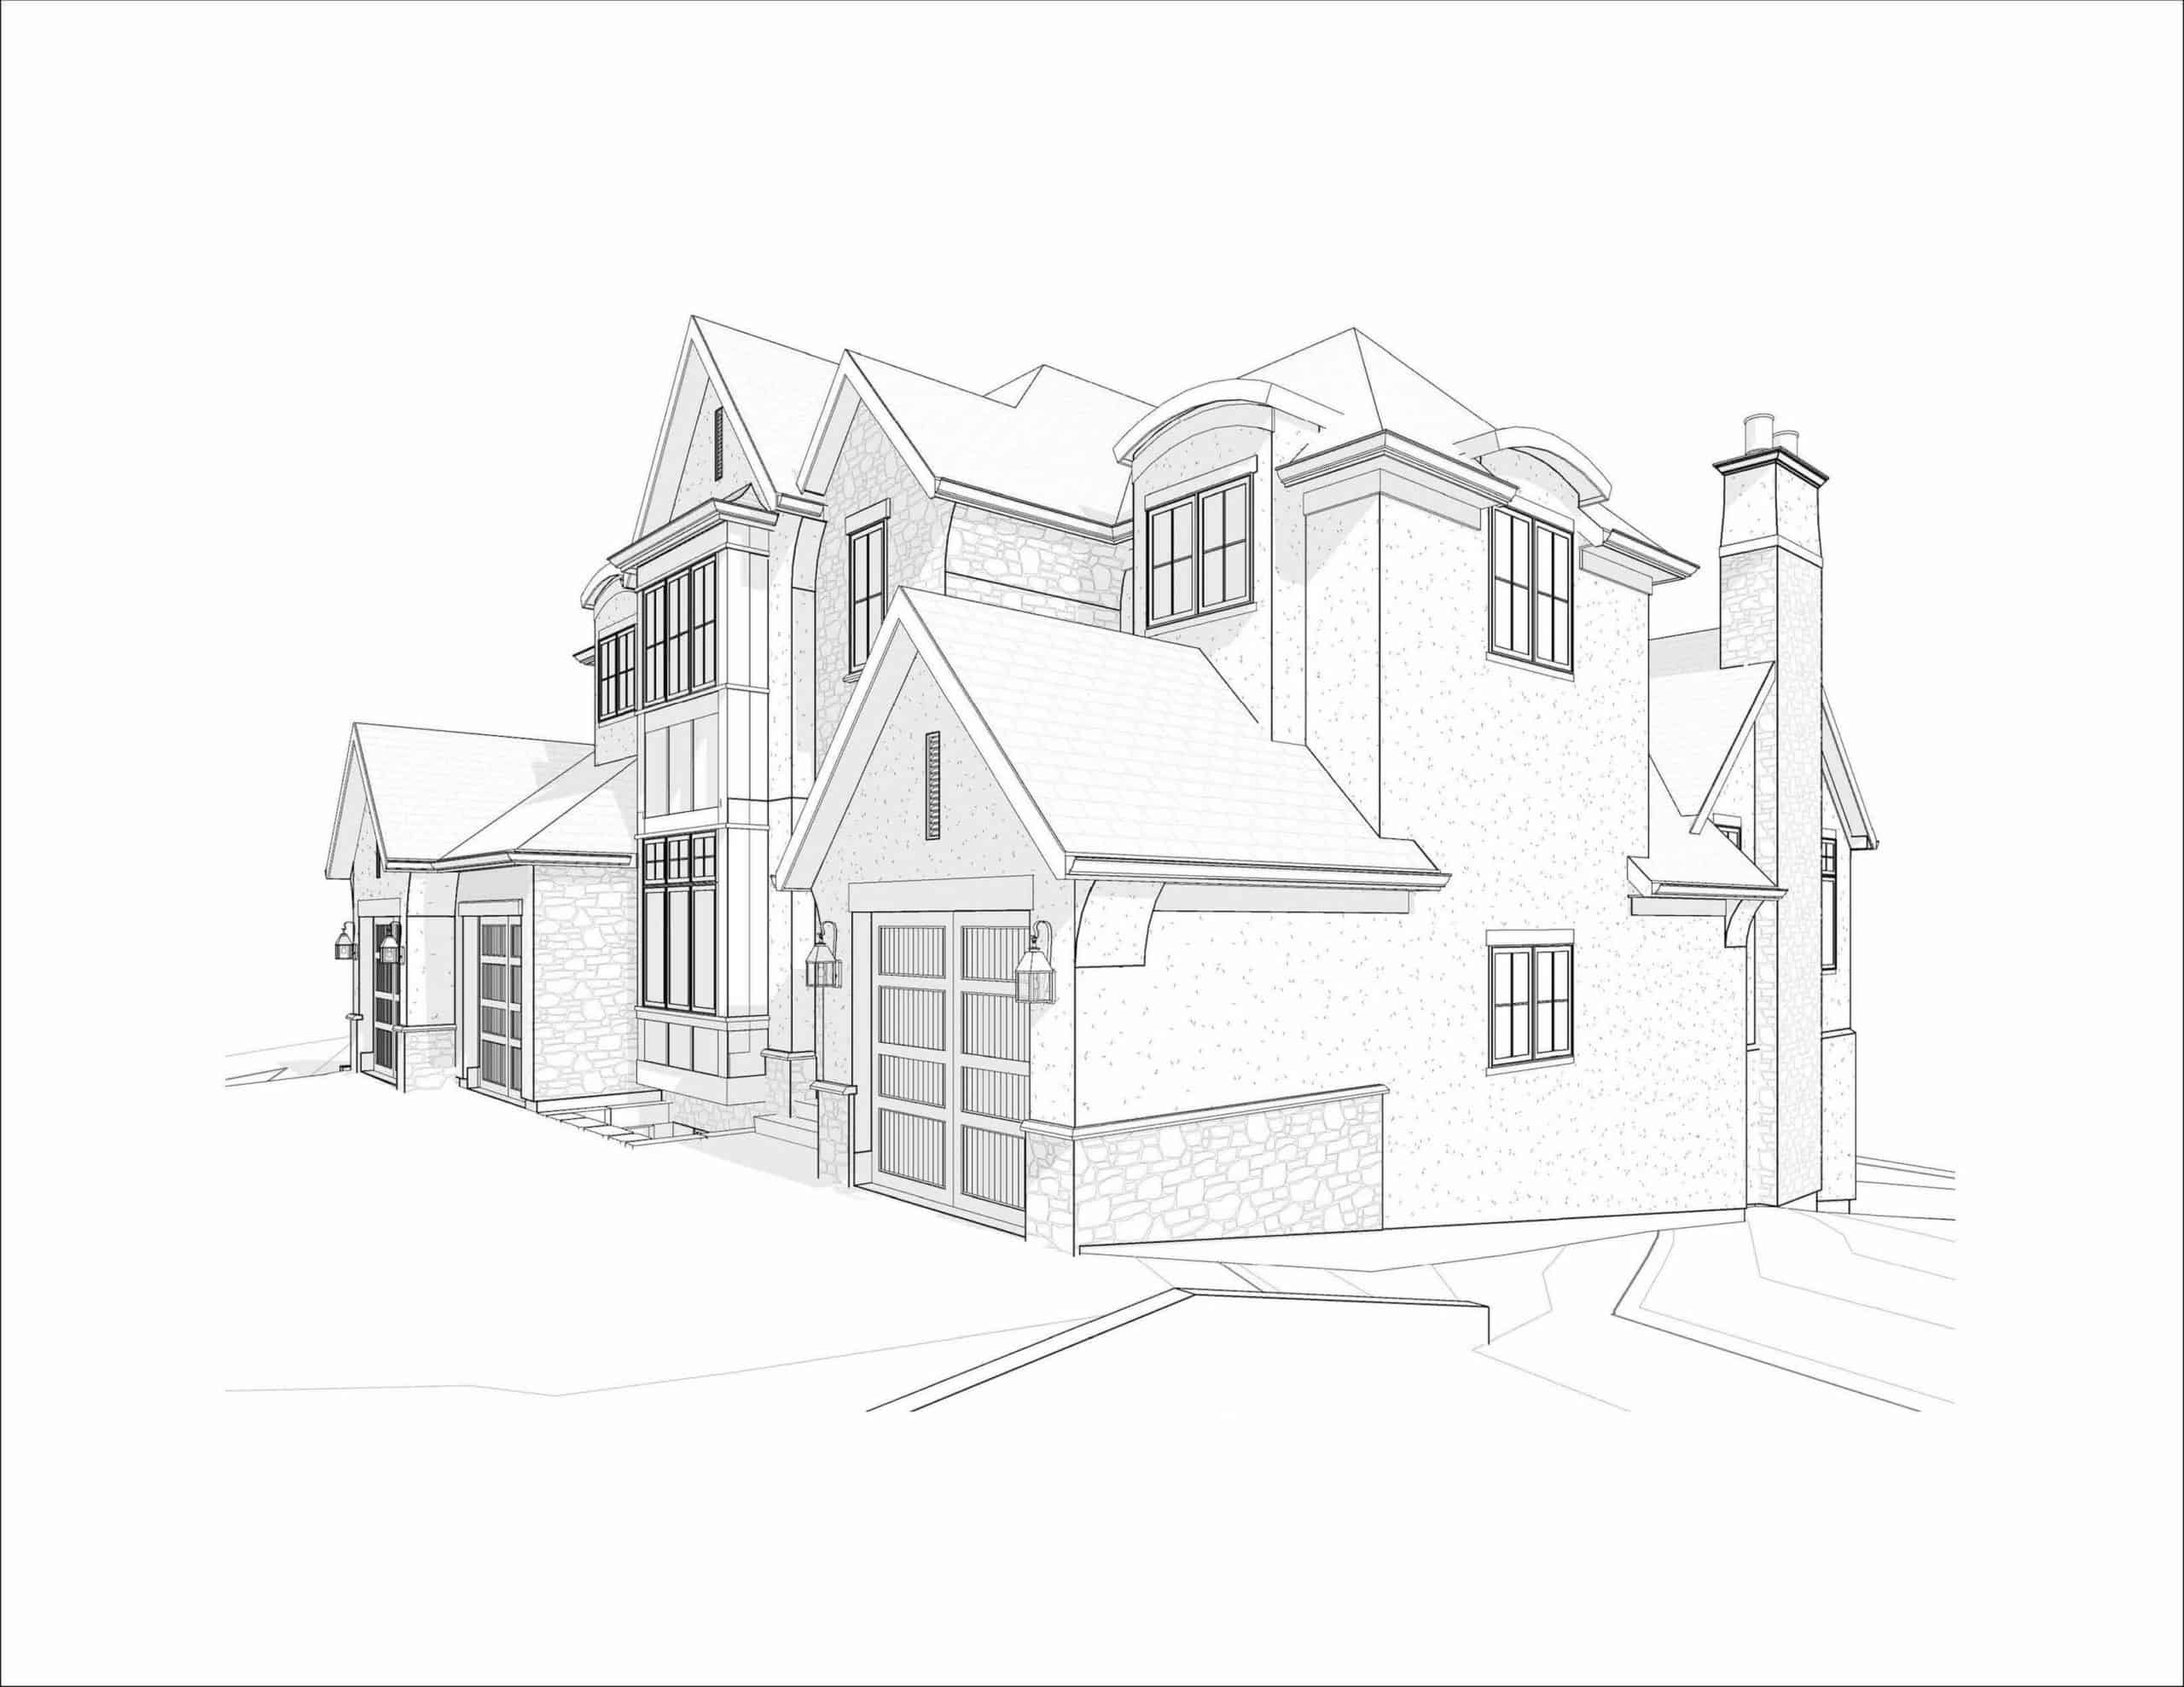 Edelweiss English Manor custom dream home